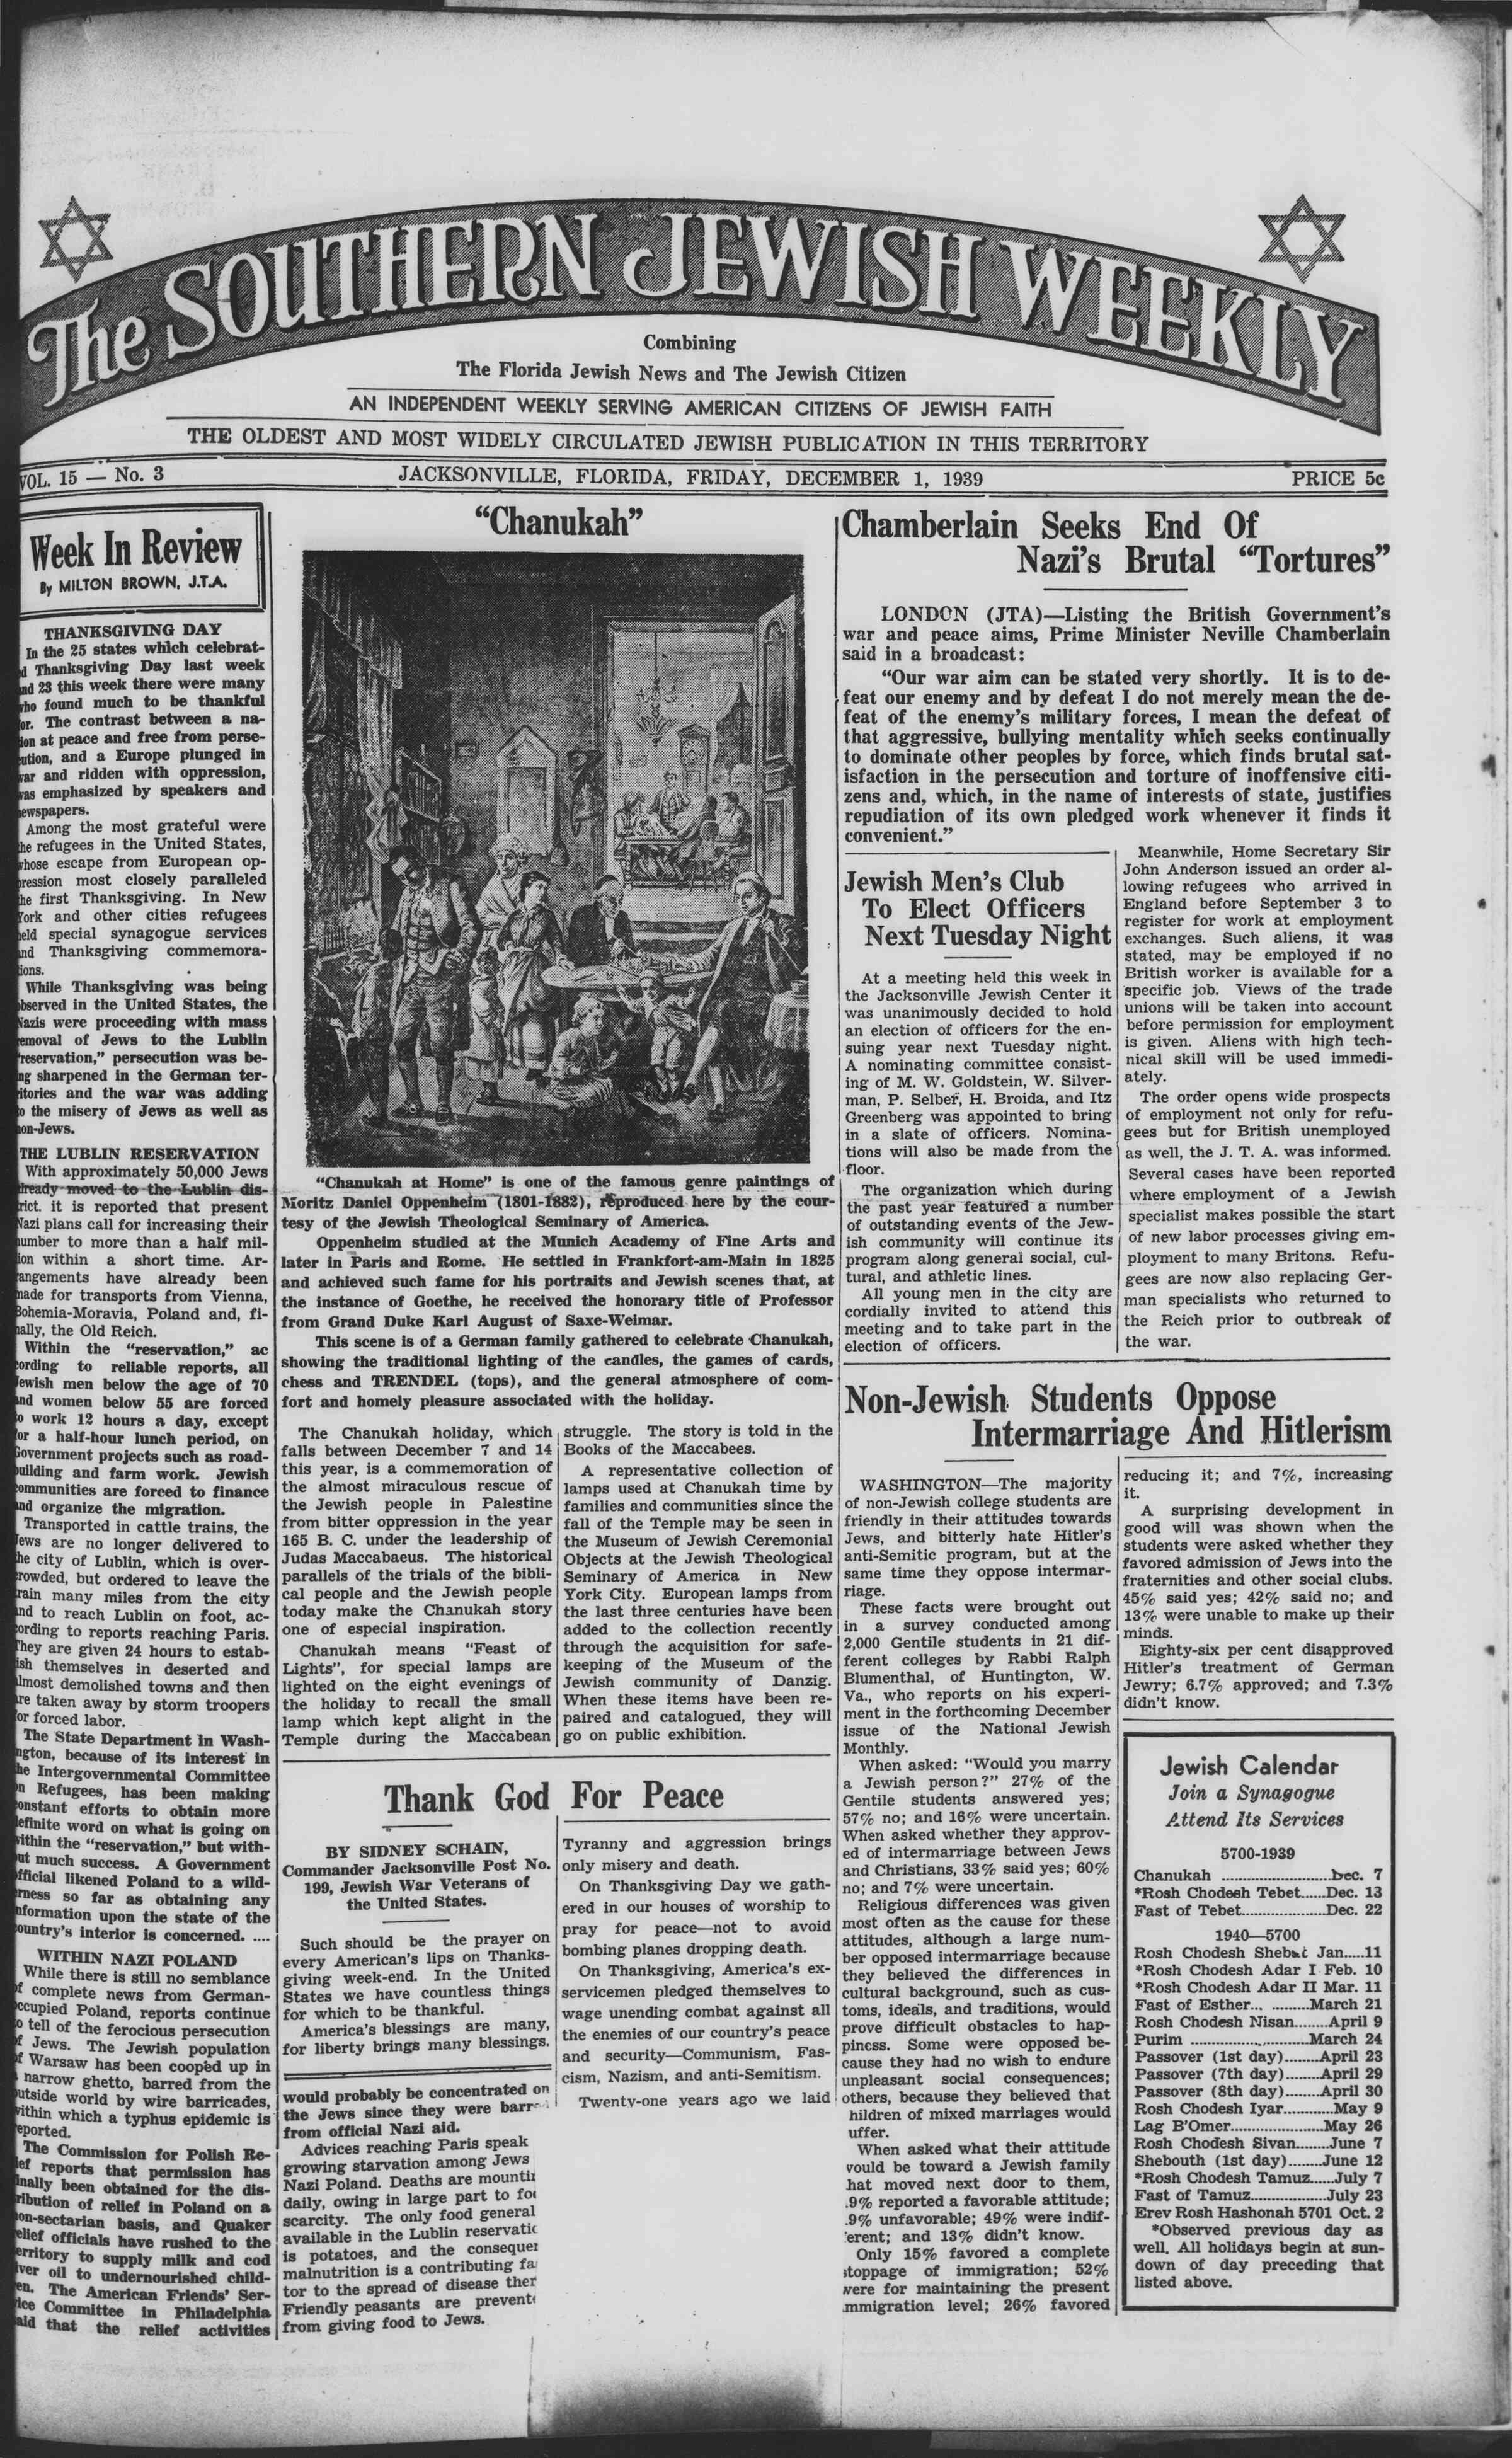 1 Aralık 1939 Tarihli Southern Jewish Weekly Dergisi Sayfa 1